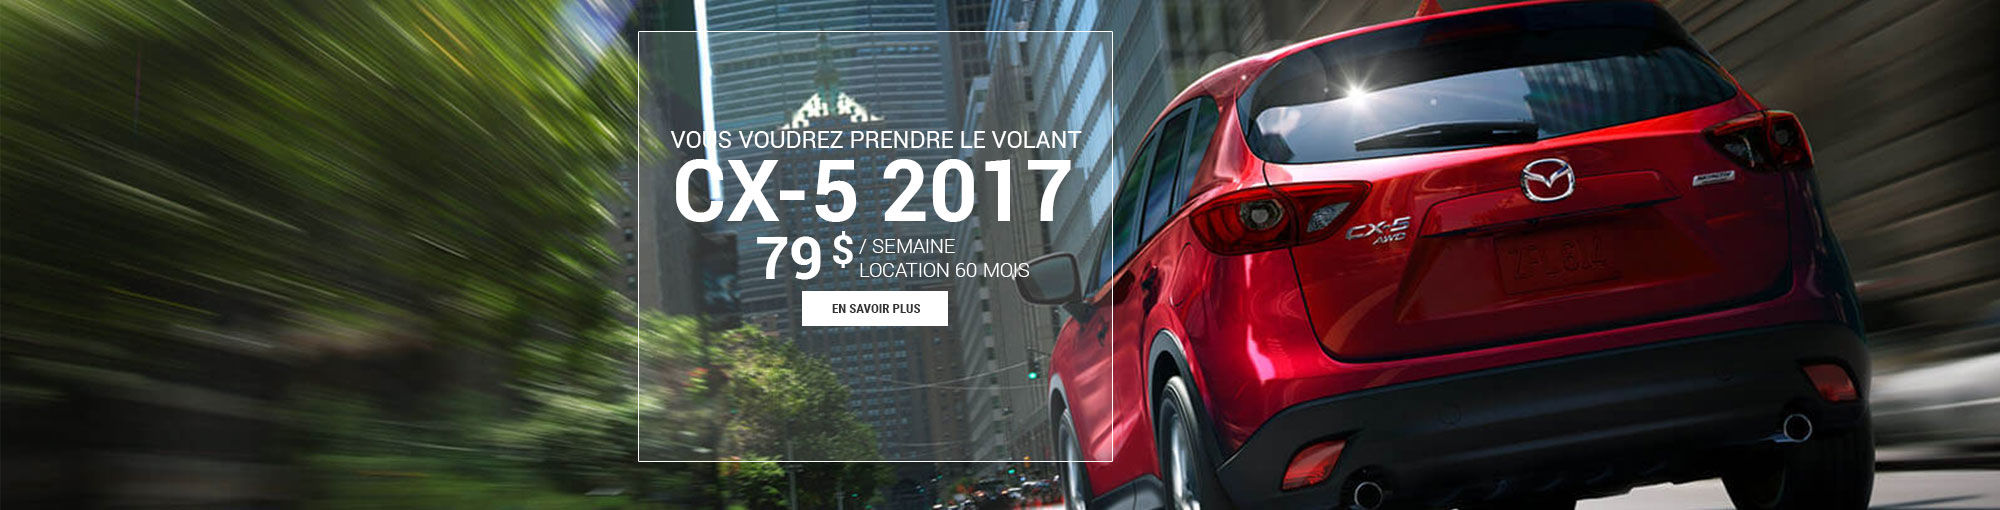 CX5 2017 - juin 2017